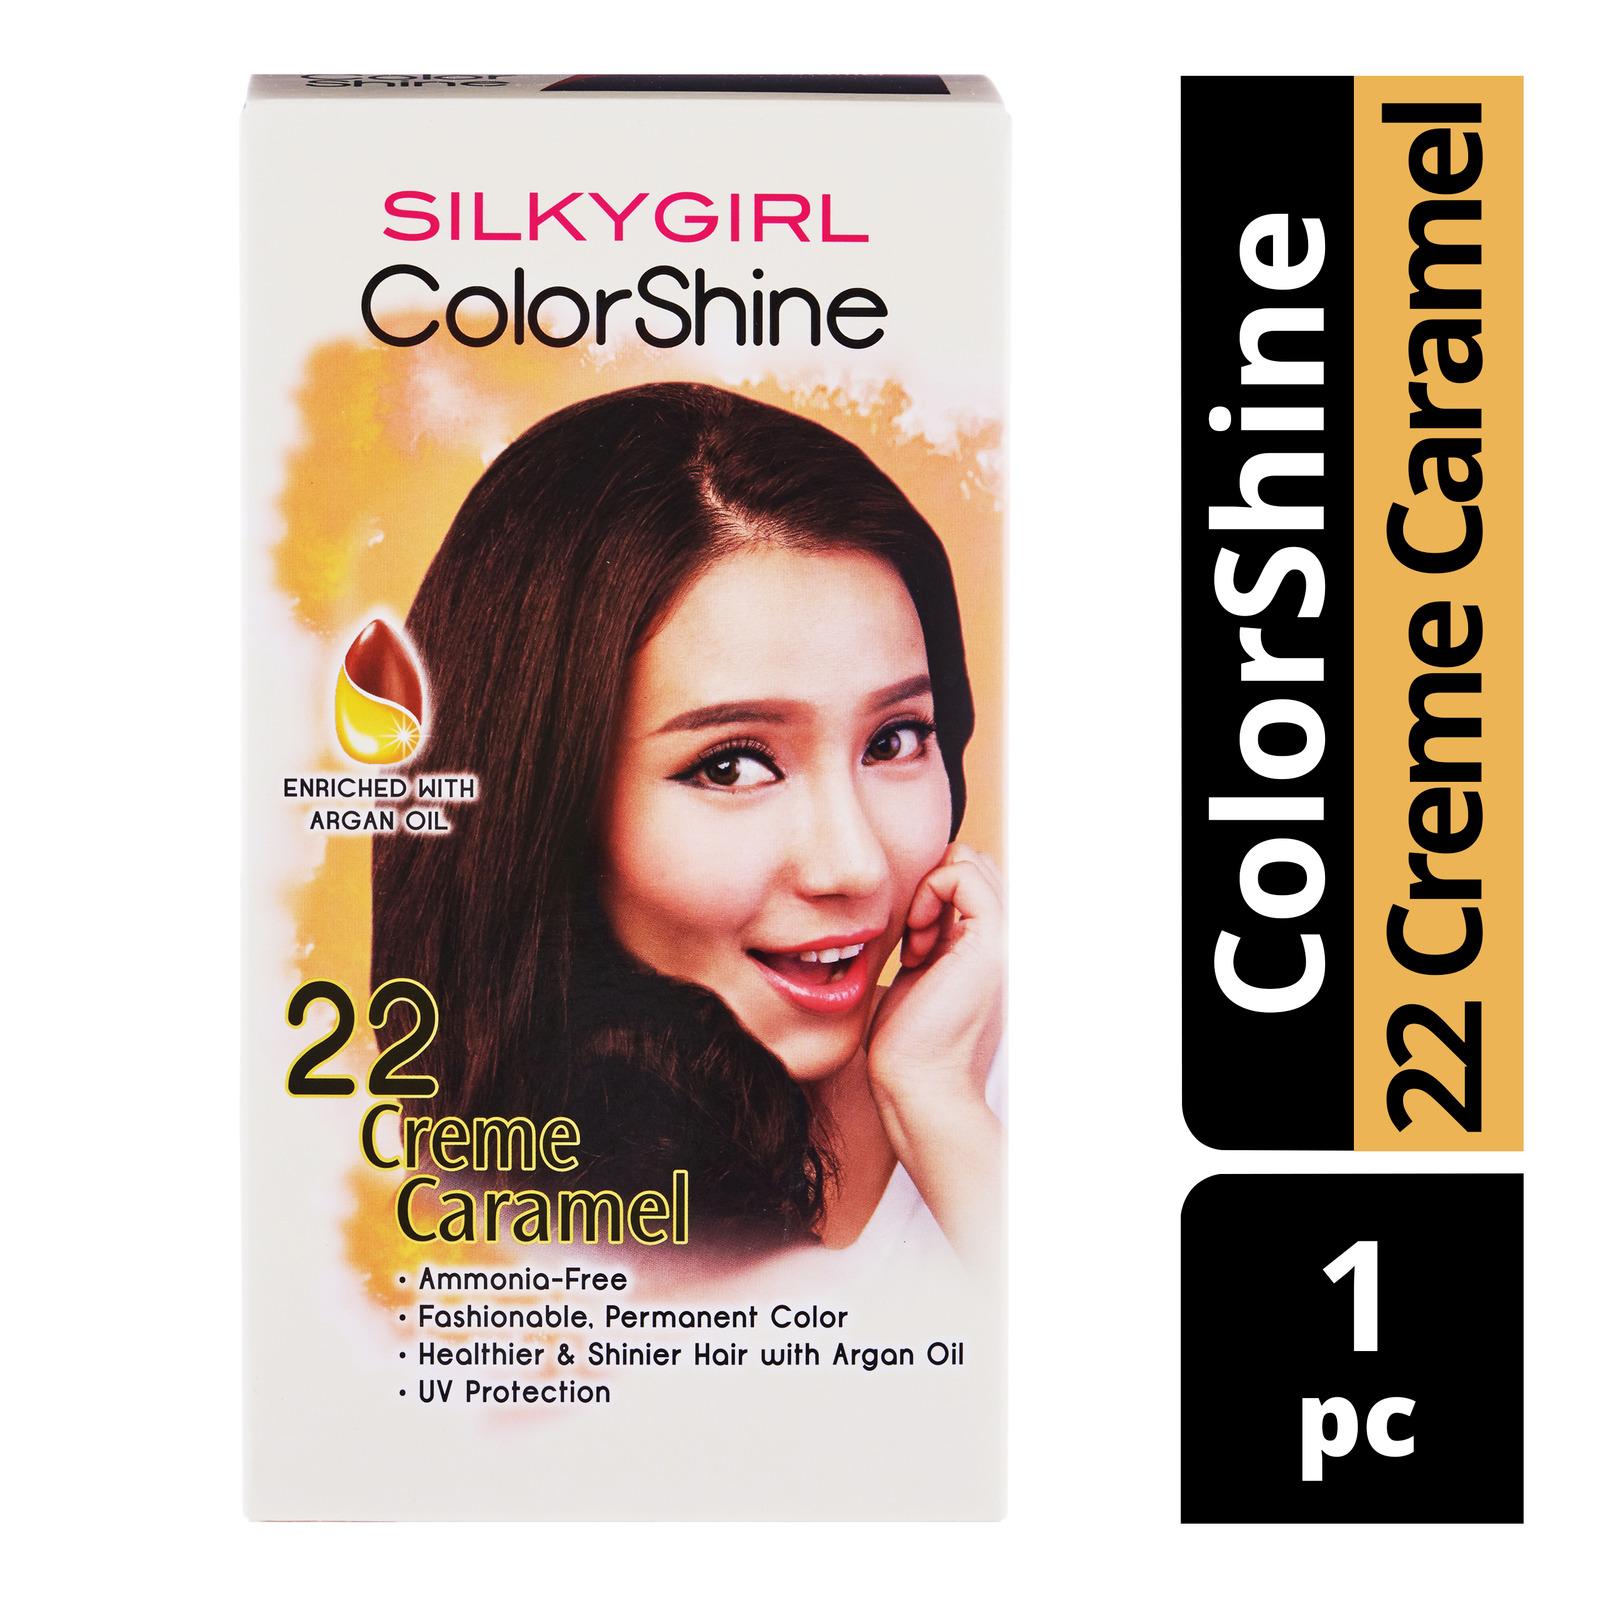 Silkygirl ColorShine Hair Colour - 22 Creme Caramel